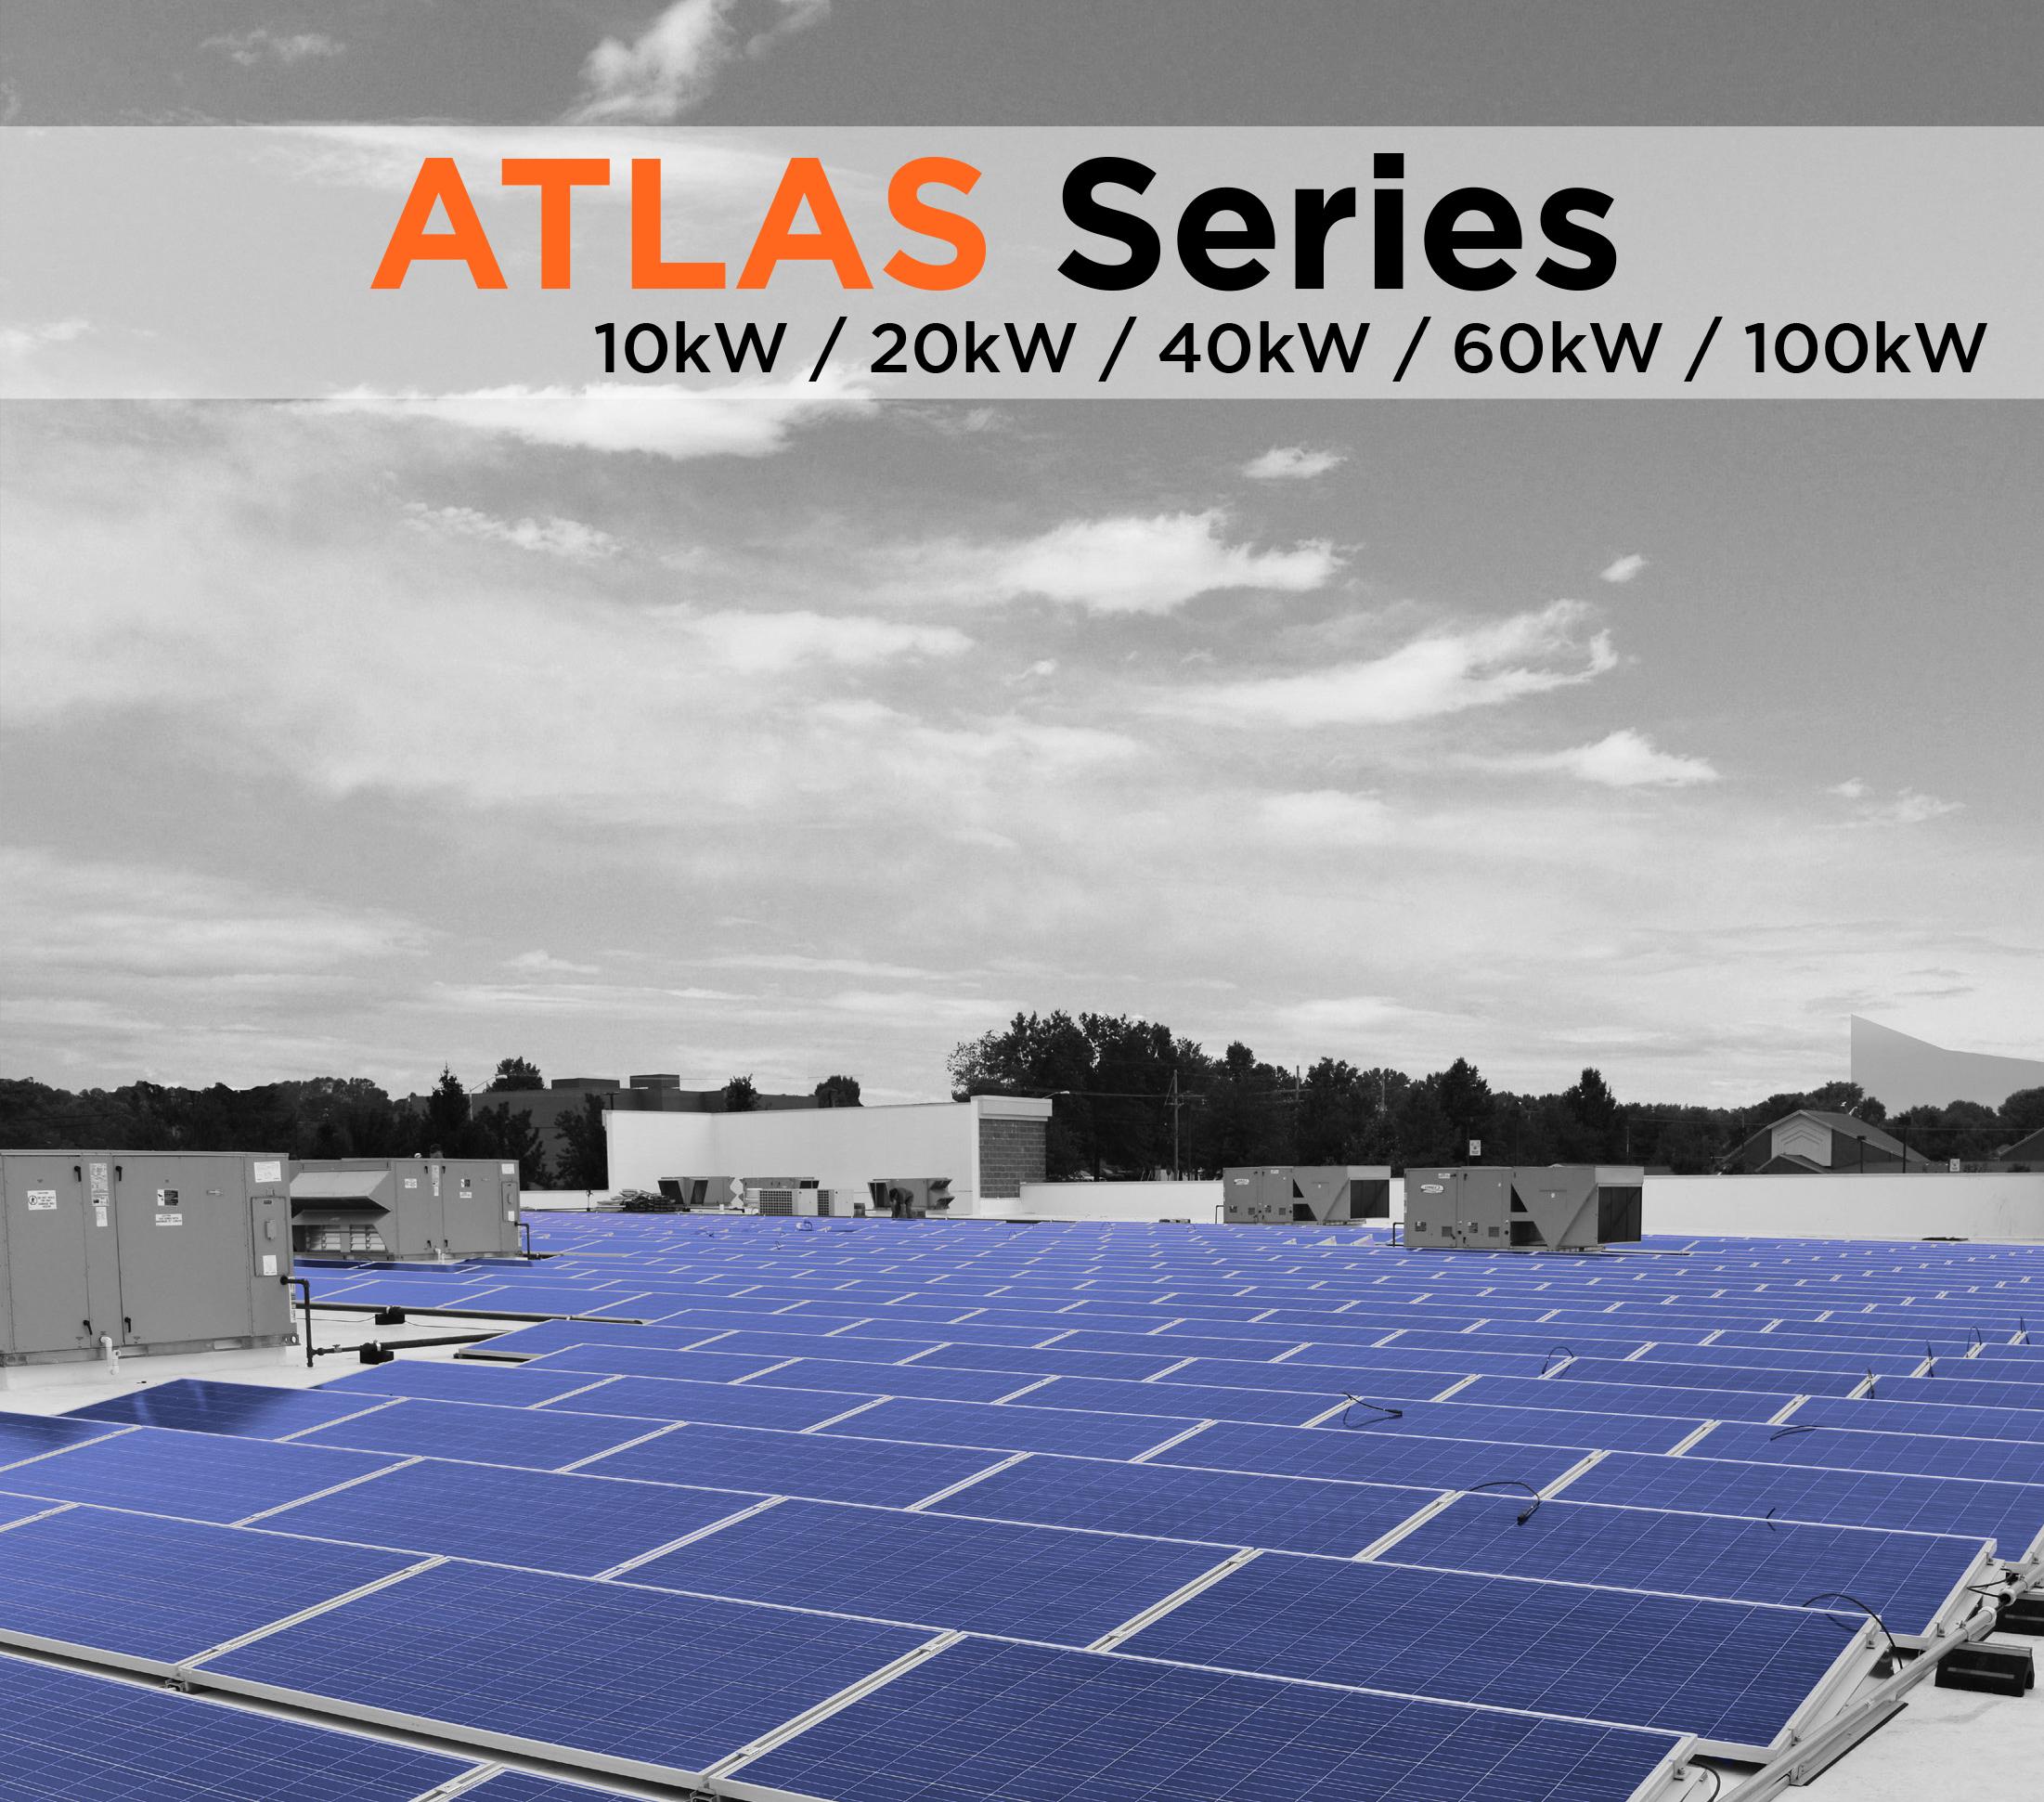 Atlas Series